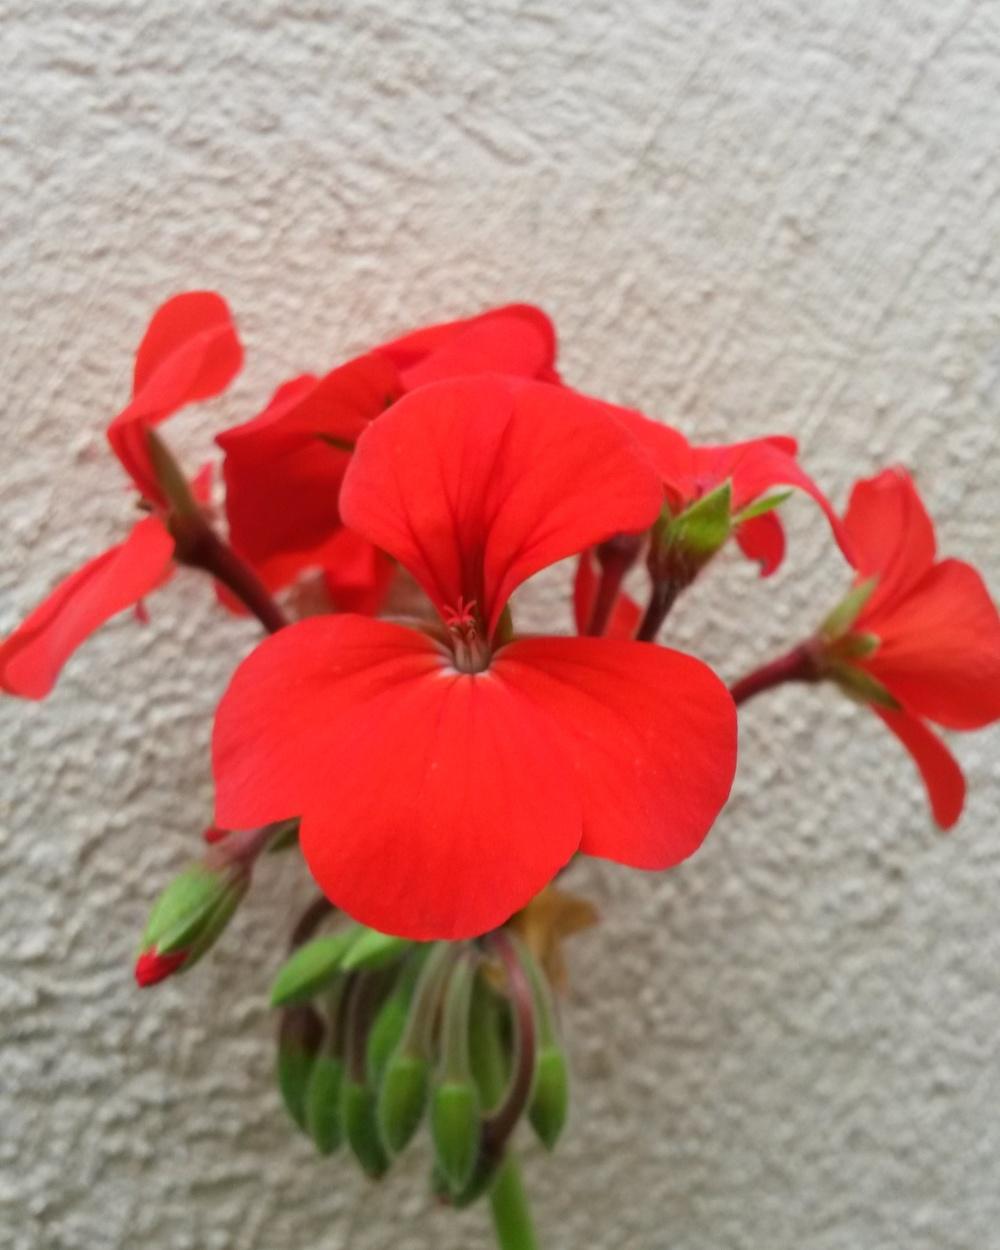 a lovely red flower